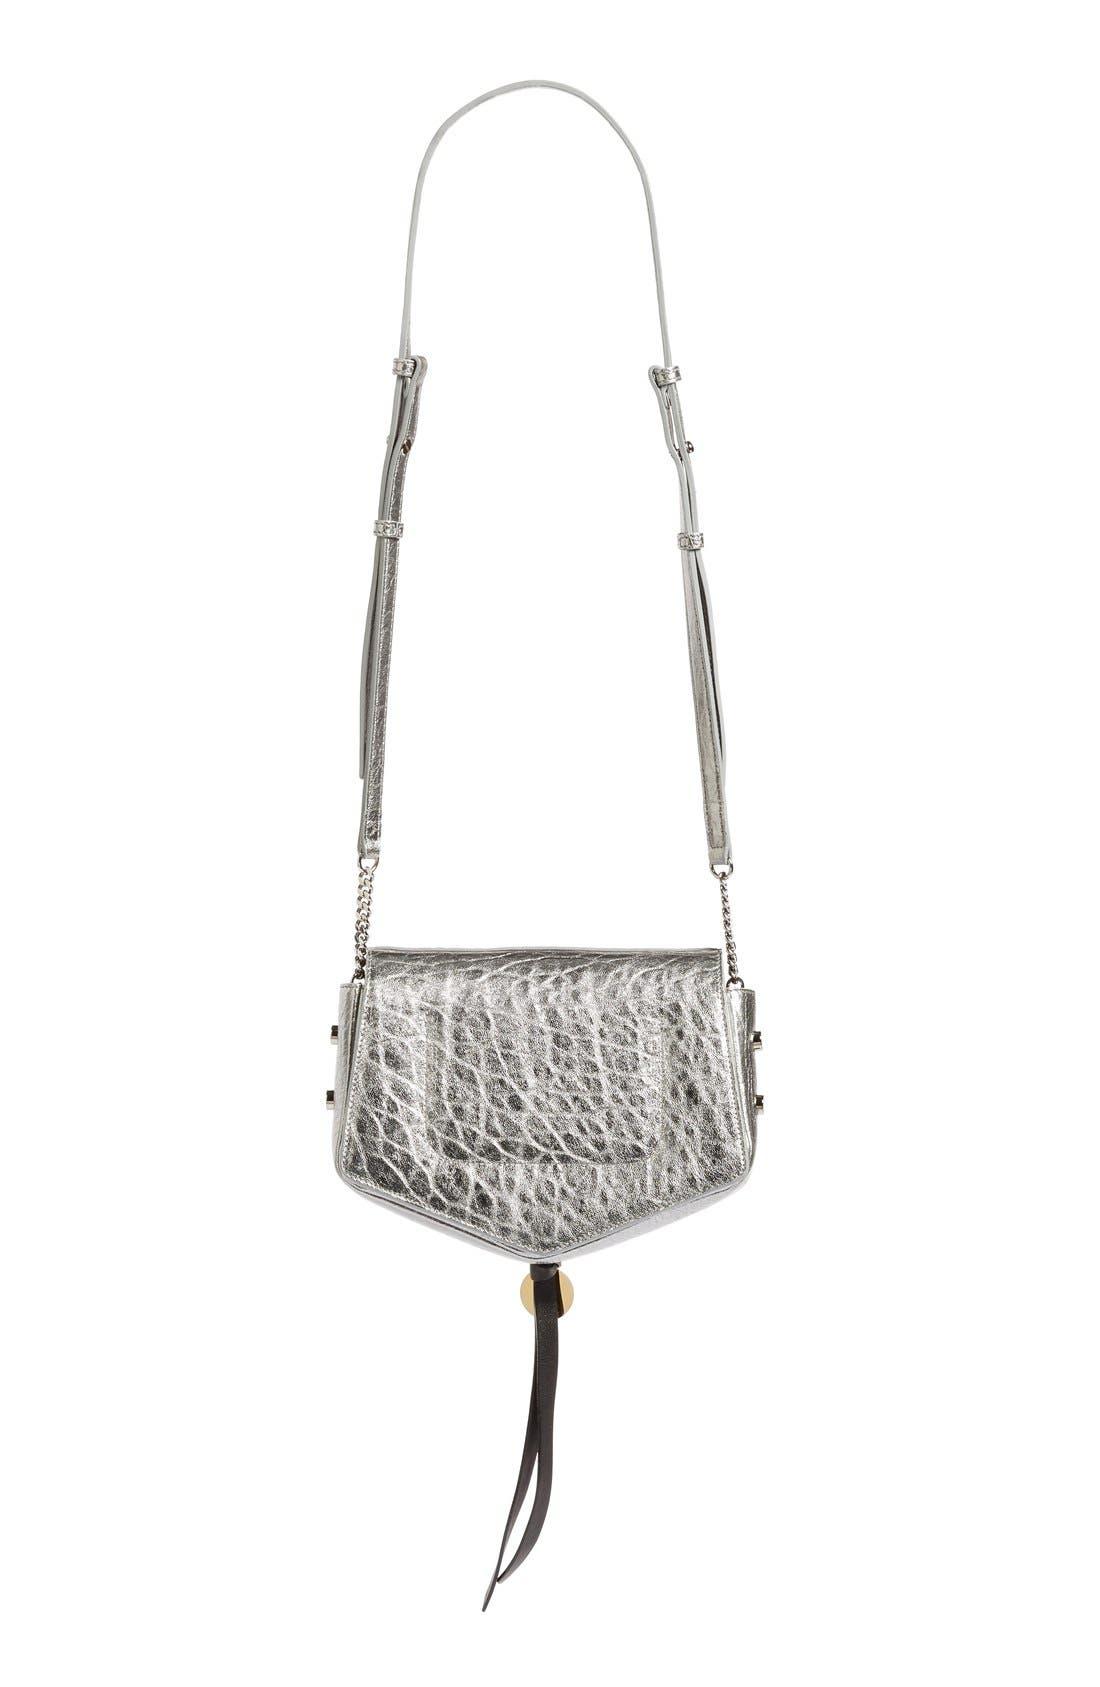 Arrow Metallic Grained Leather Shoulder Bag,                             Alternate thumbnail 3, color,                             045